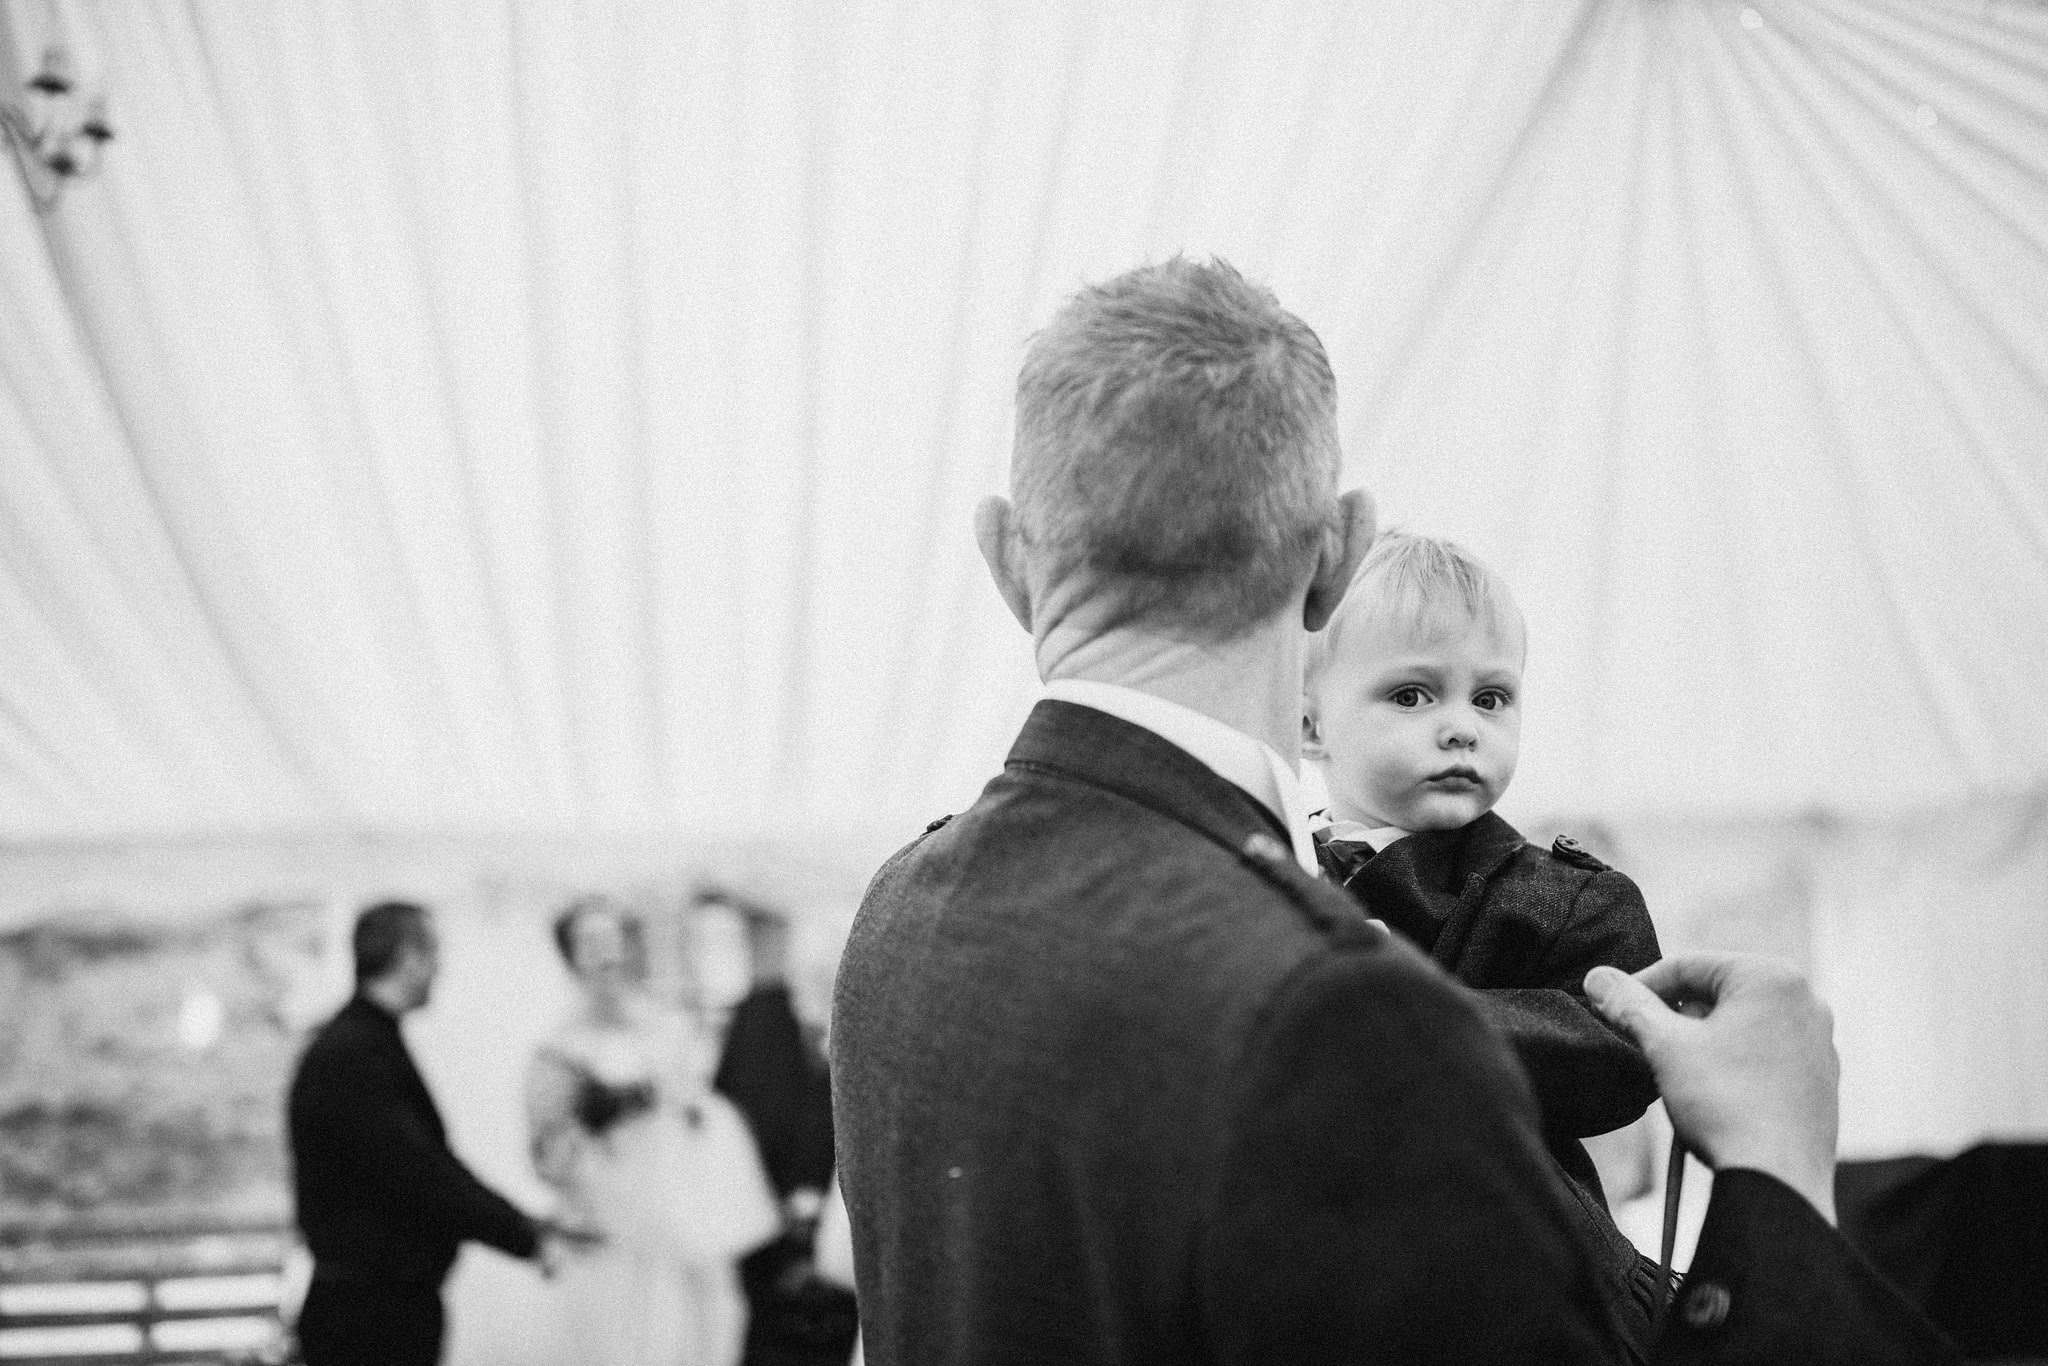 kirknewton stables wedding photographer (26).jpg